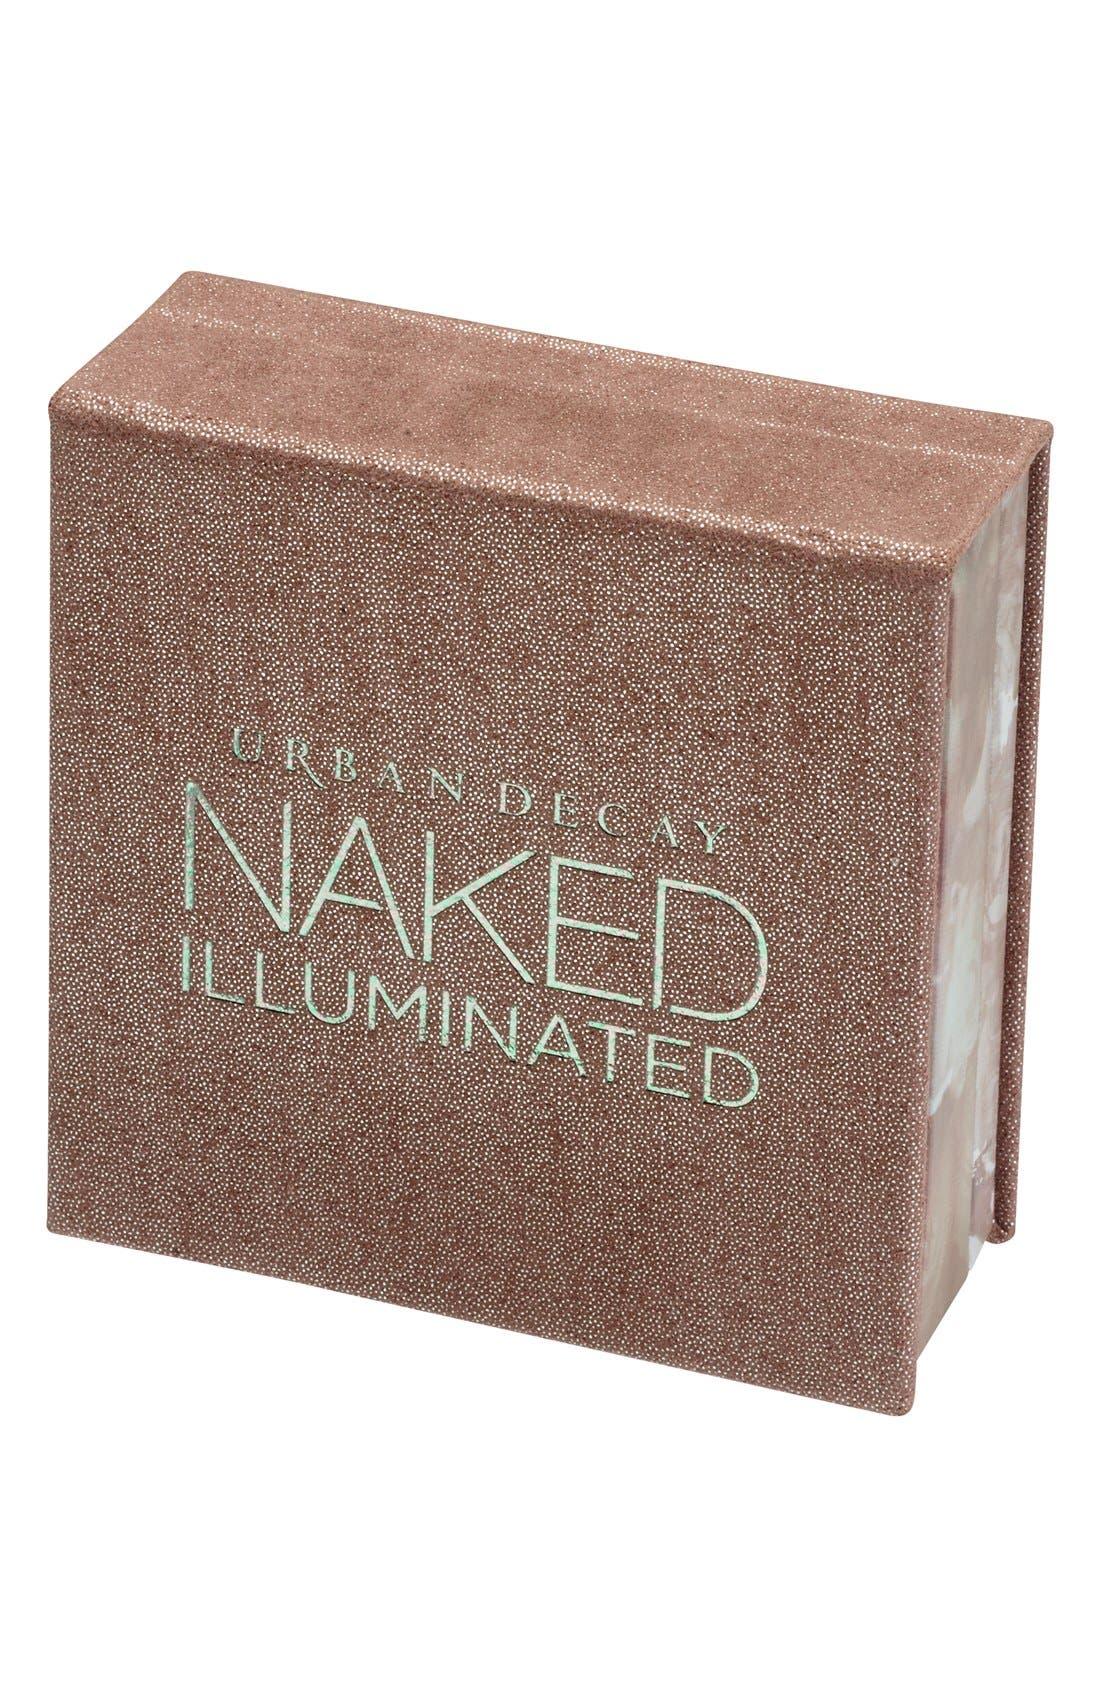 Naked Illuminated Shimmering Powder for Face & Body,                         Main,                         color, LUMINOUS